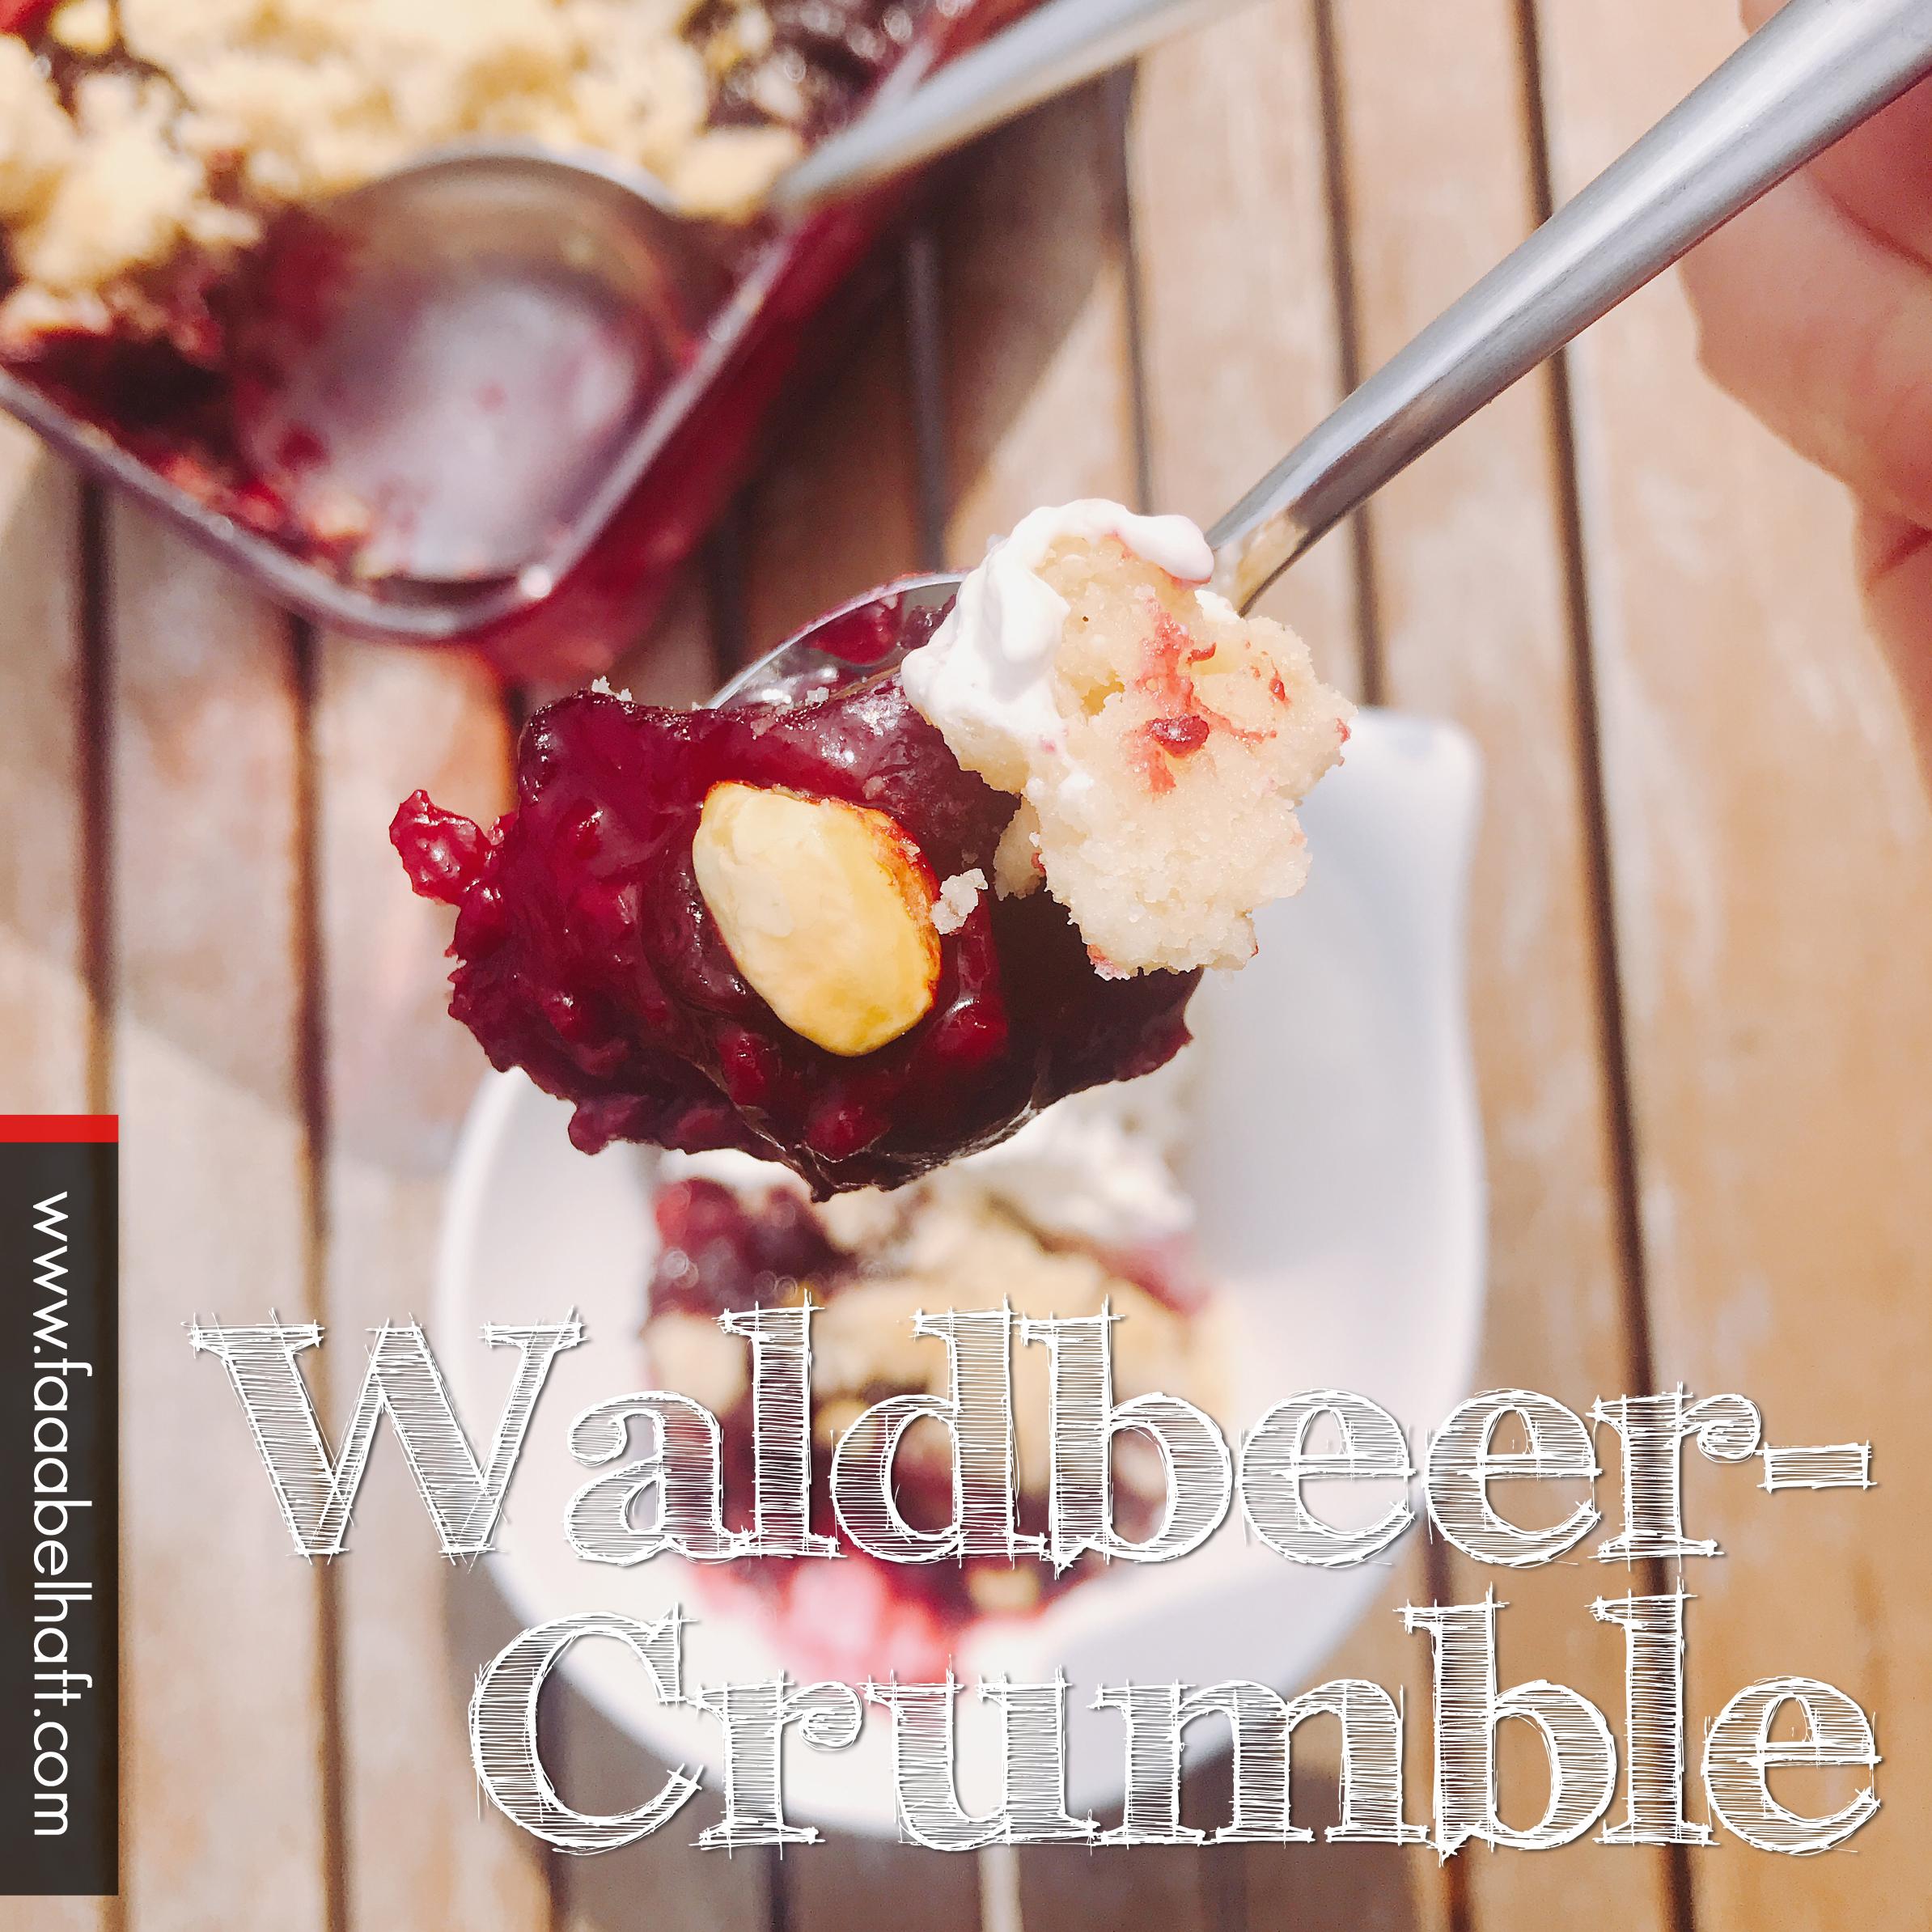 190412-Crumble - Waldbeer 1